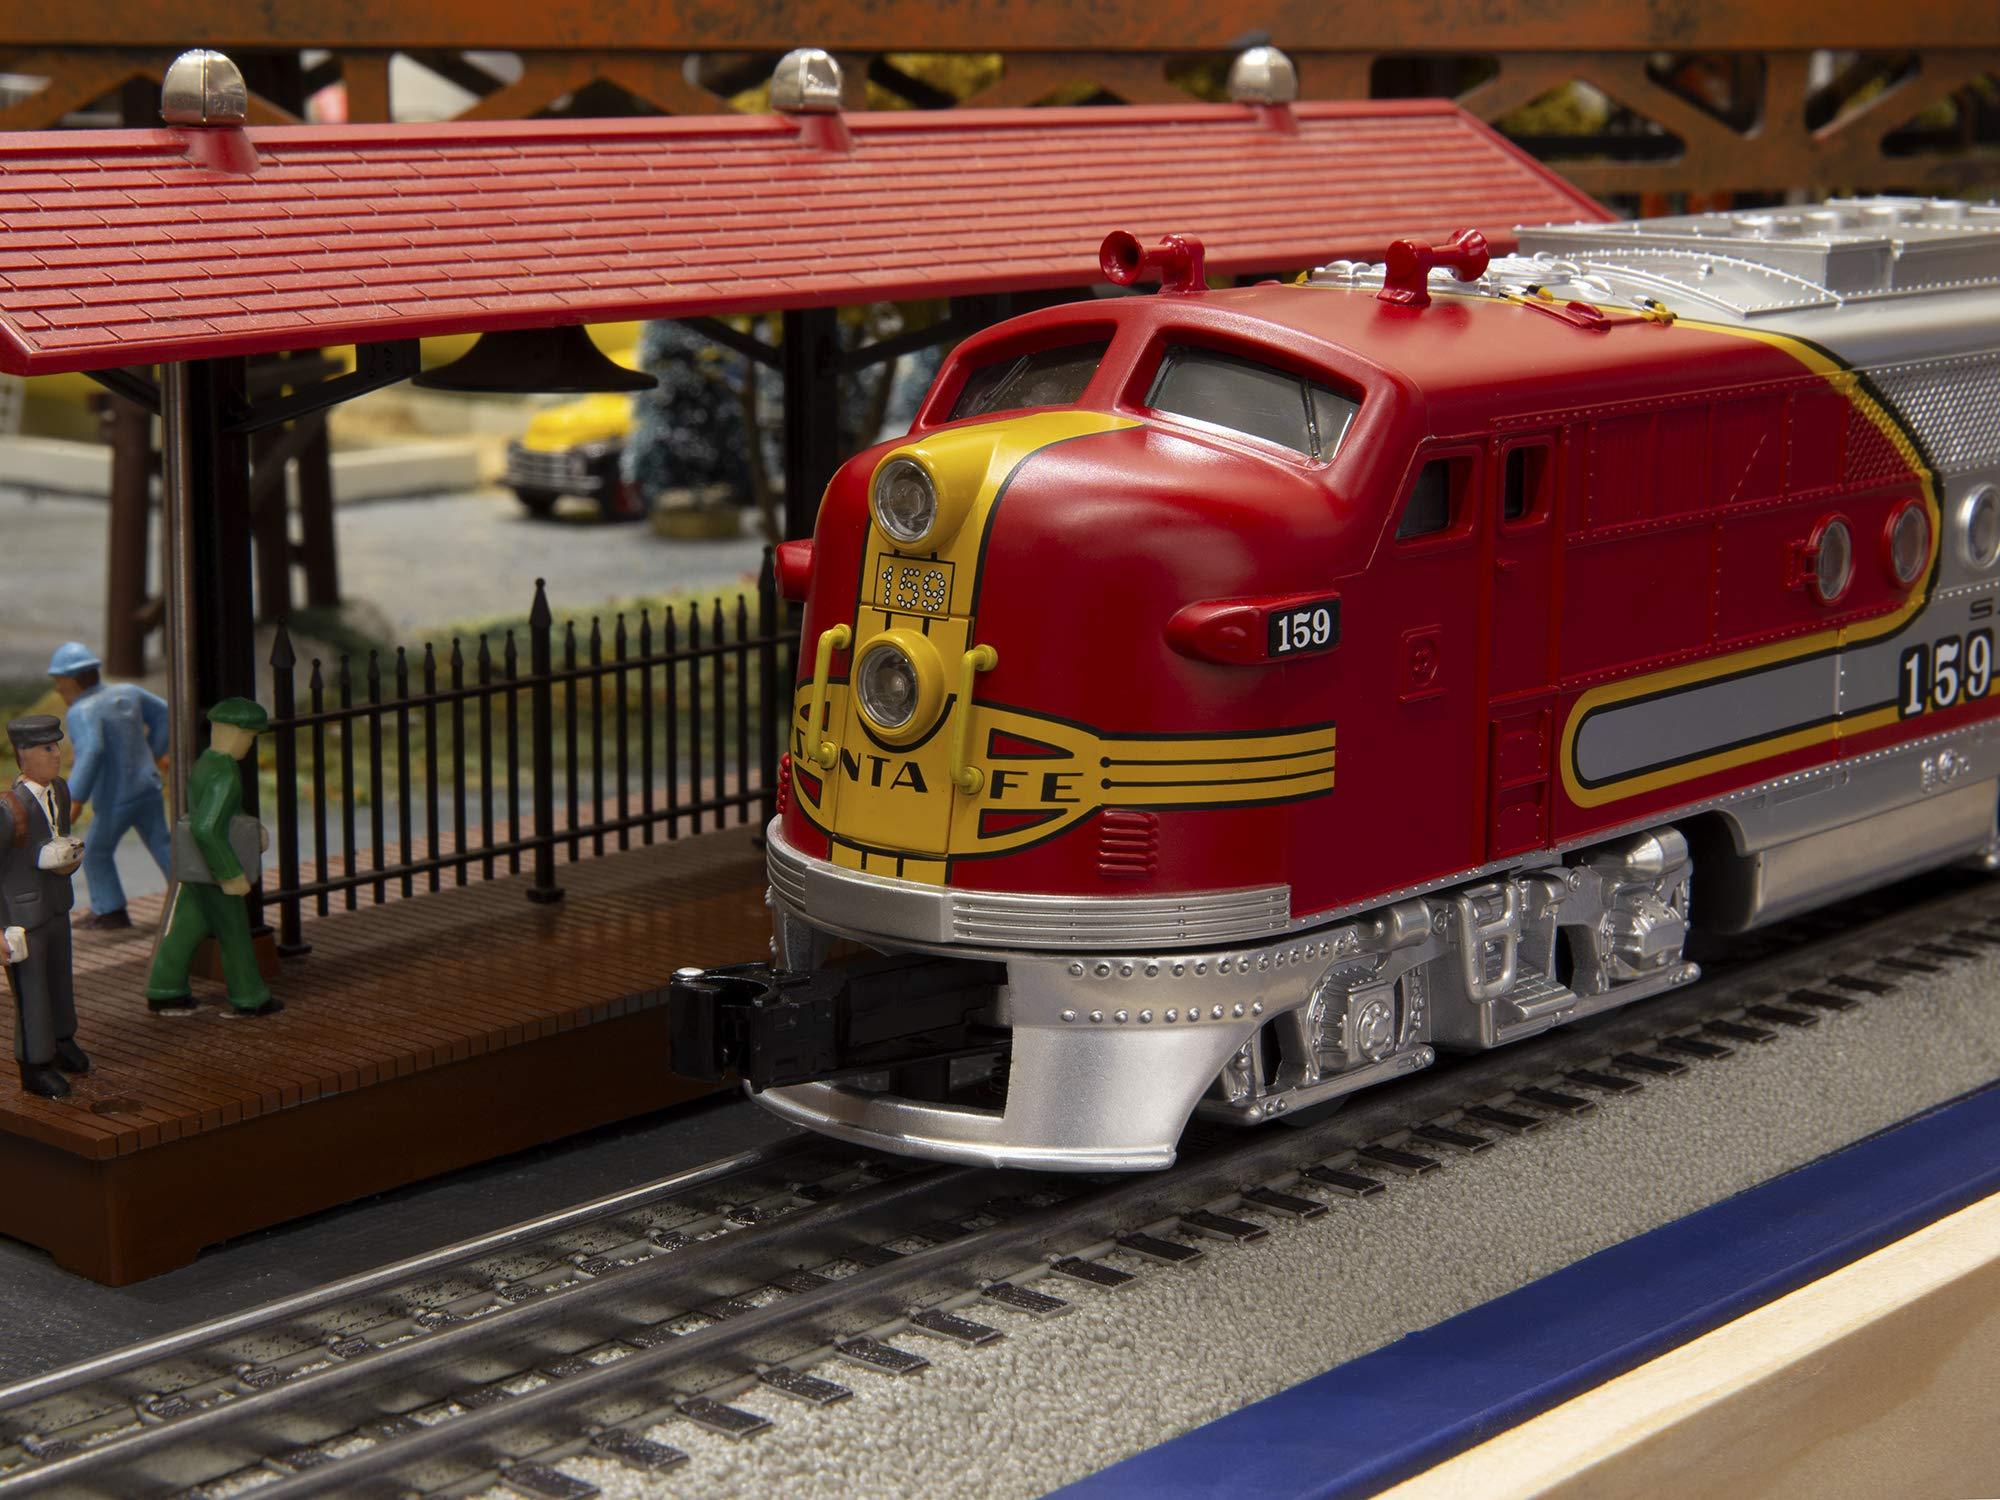 Lionel Santa Fe Super Chief Electric O Gauge Model Train Set w/ Remote and Bluetooth Capability by Lionel (Image #2)